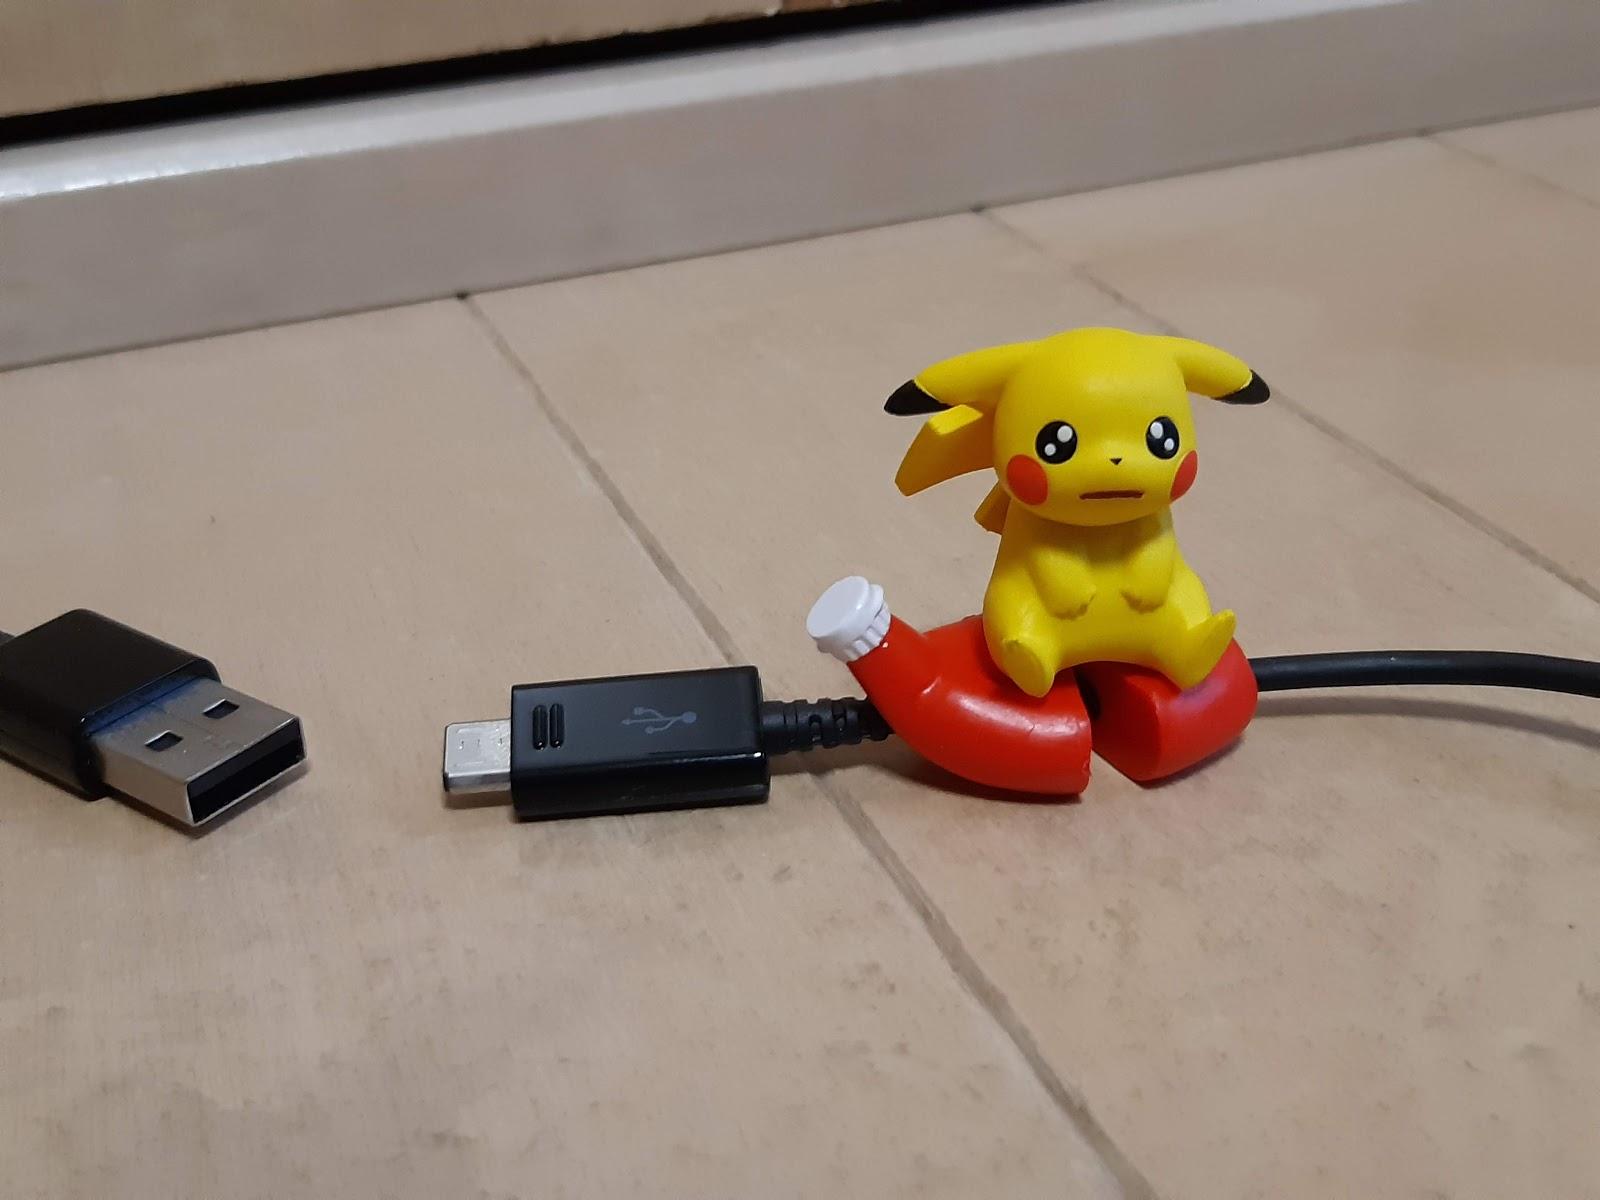 Re-Ment Pokemon Micro-USB Cord Keeper